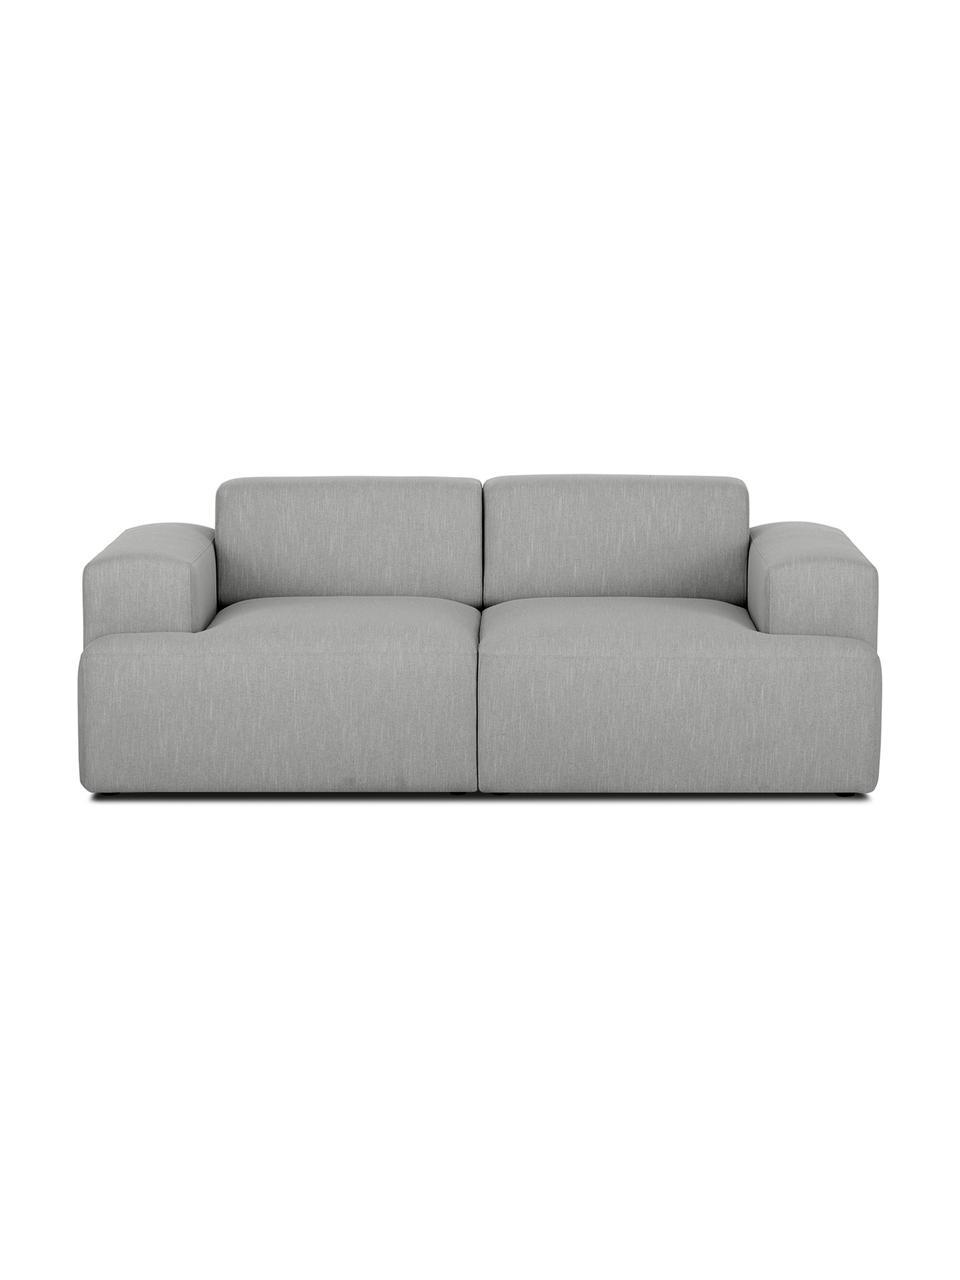 Sofa Melva (2-Sitzer) in Grau, Bezug: Polyester Der hochwertige, Gestell: Massives Kiefernholz, Spa, Füße: Kiefernholz Die Füße befi, Webstoff Grau, B 200 x T 101 cm